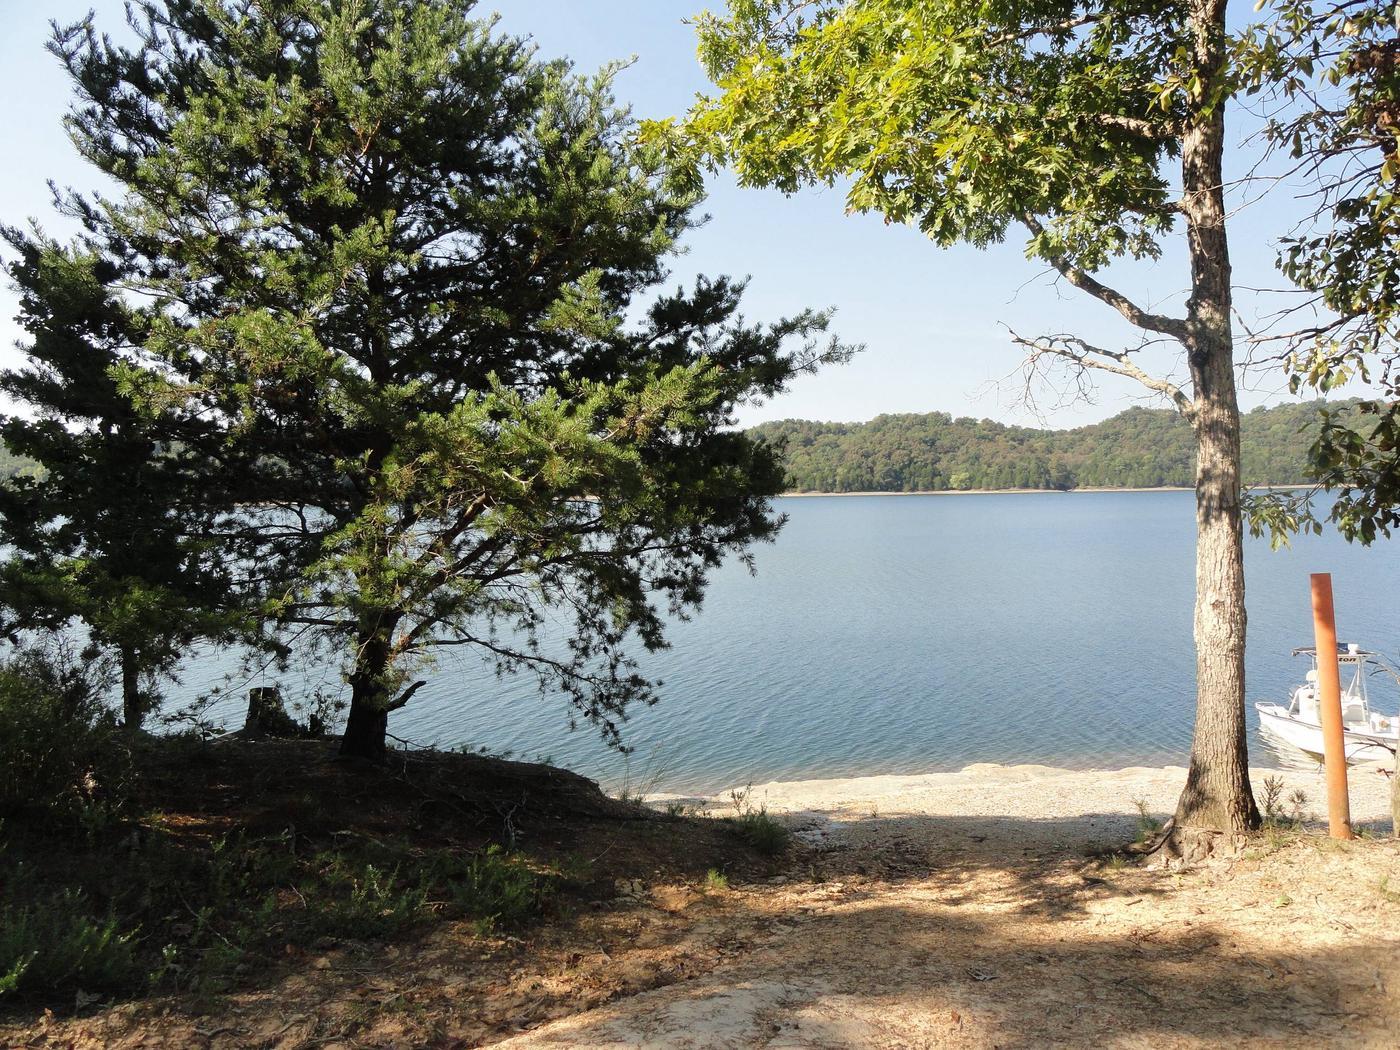 DALE HOLLOW LAKE - PRIMITIVE CAMPING LAKE FRONT TENT CAMPING